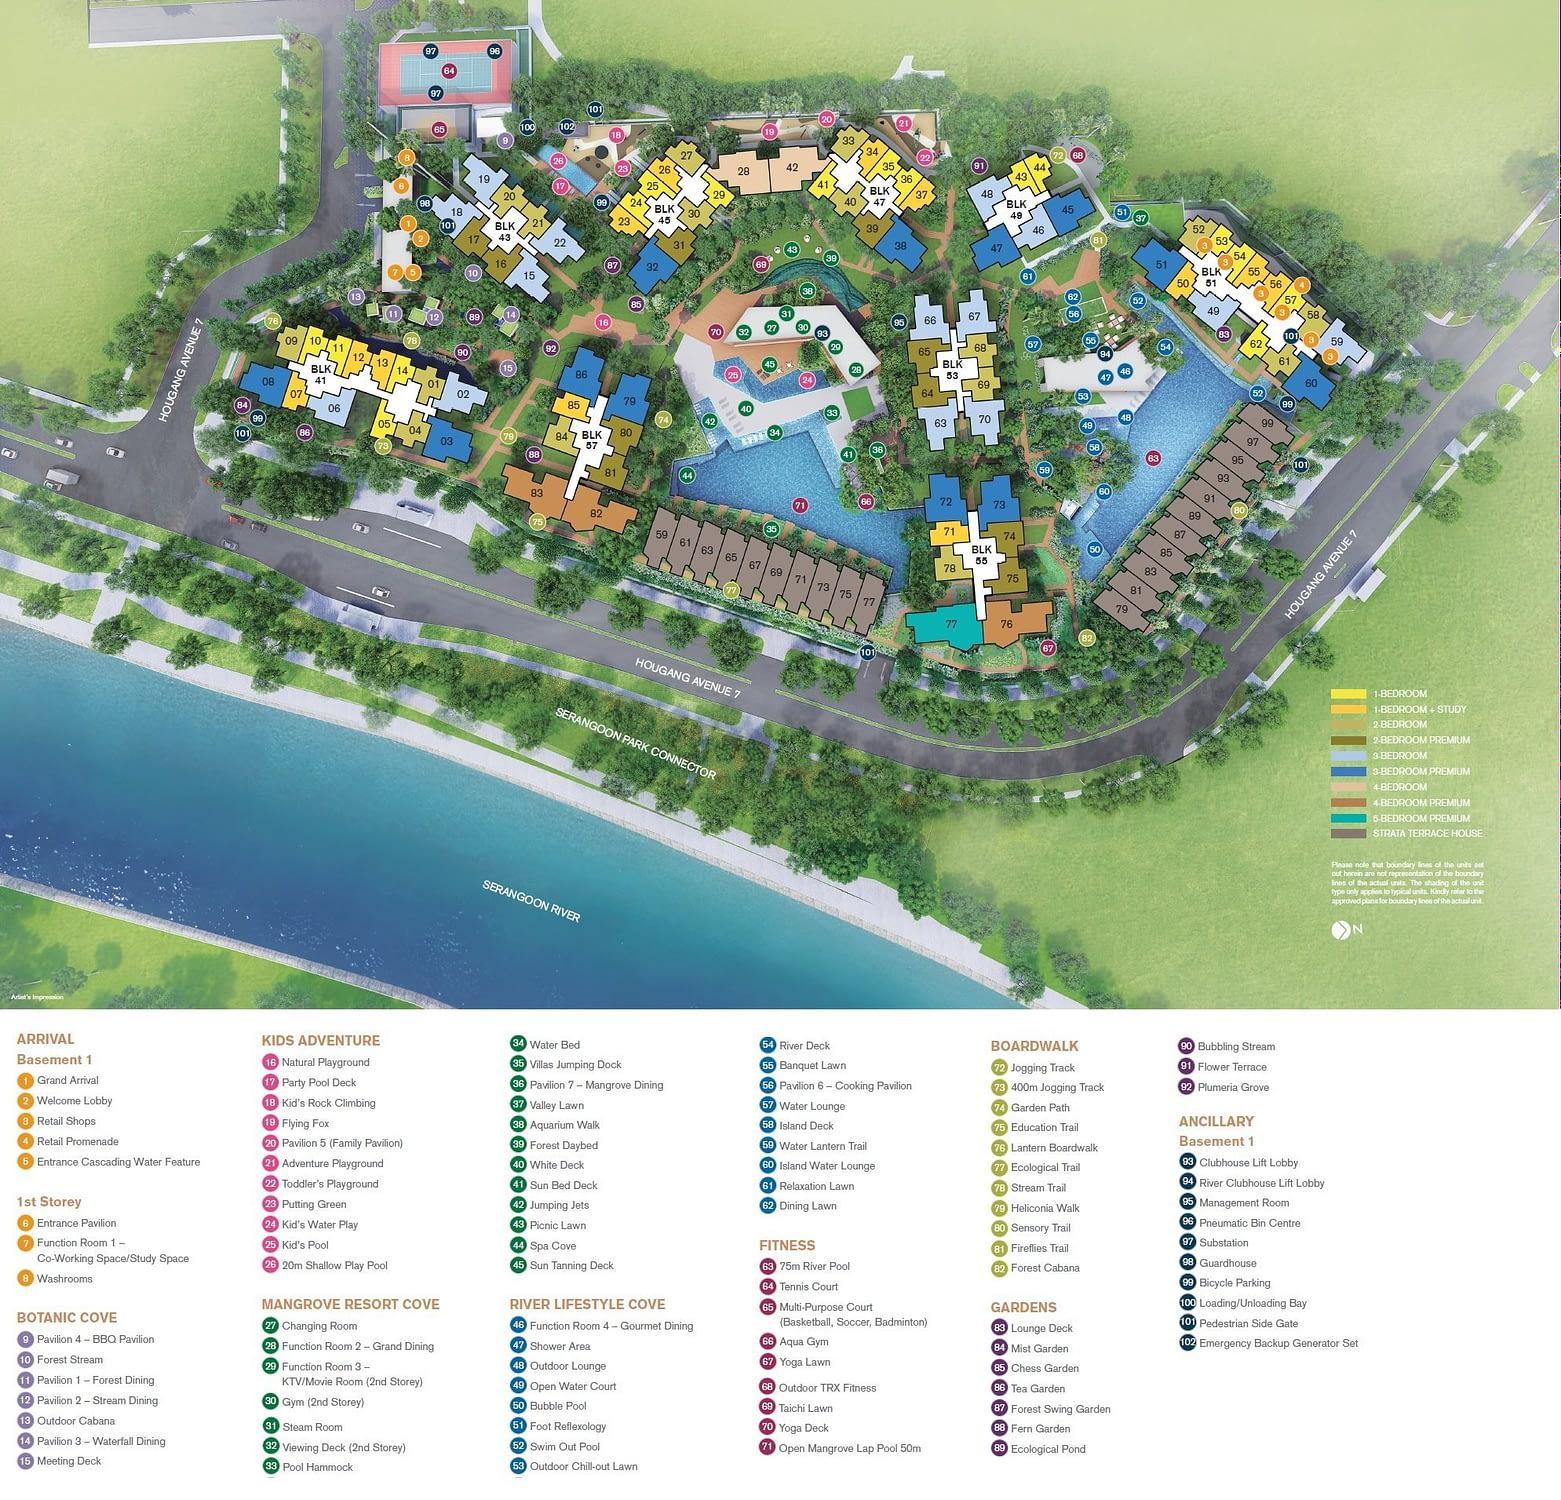 Riverfront Residences Riverfront Residences Siteplan